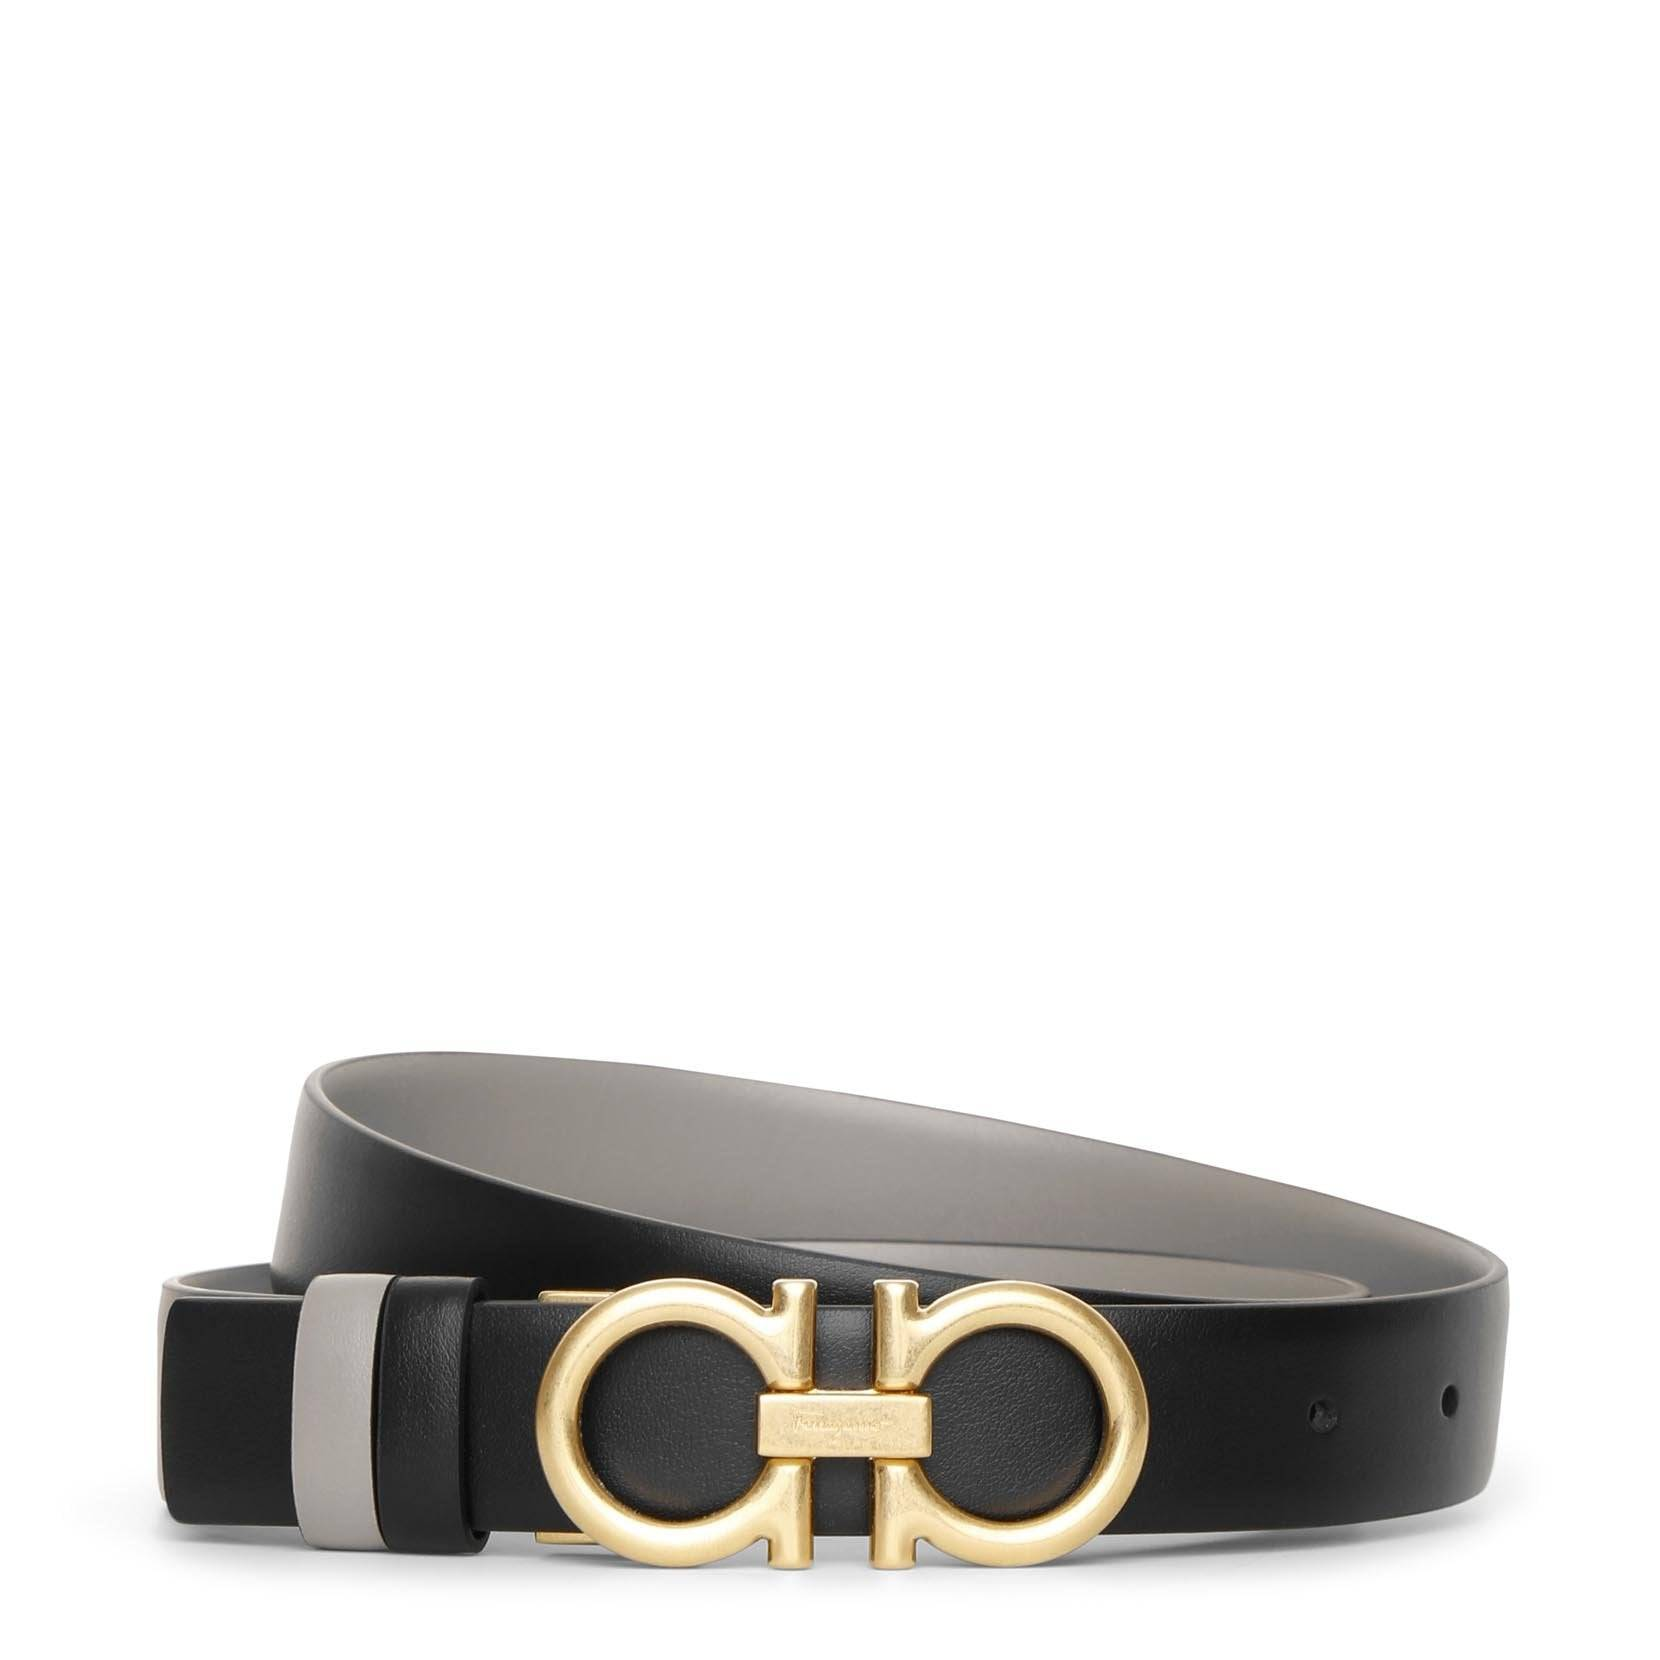 Salvatore Ferragamo Reversable and adjustable grey black leather belt  - black/grey - female - Size: 90